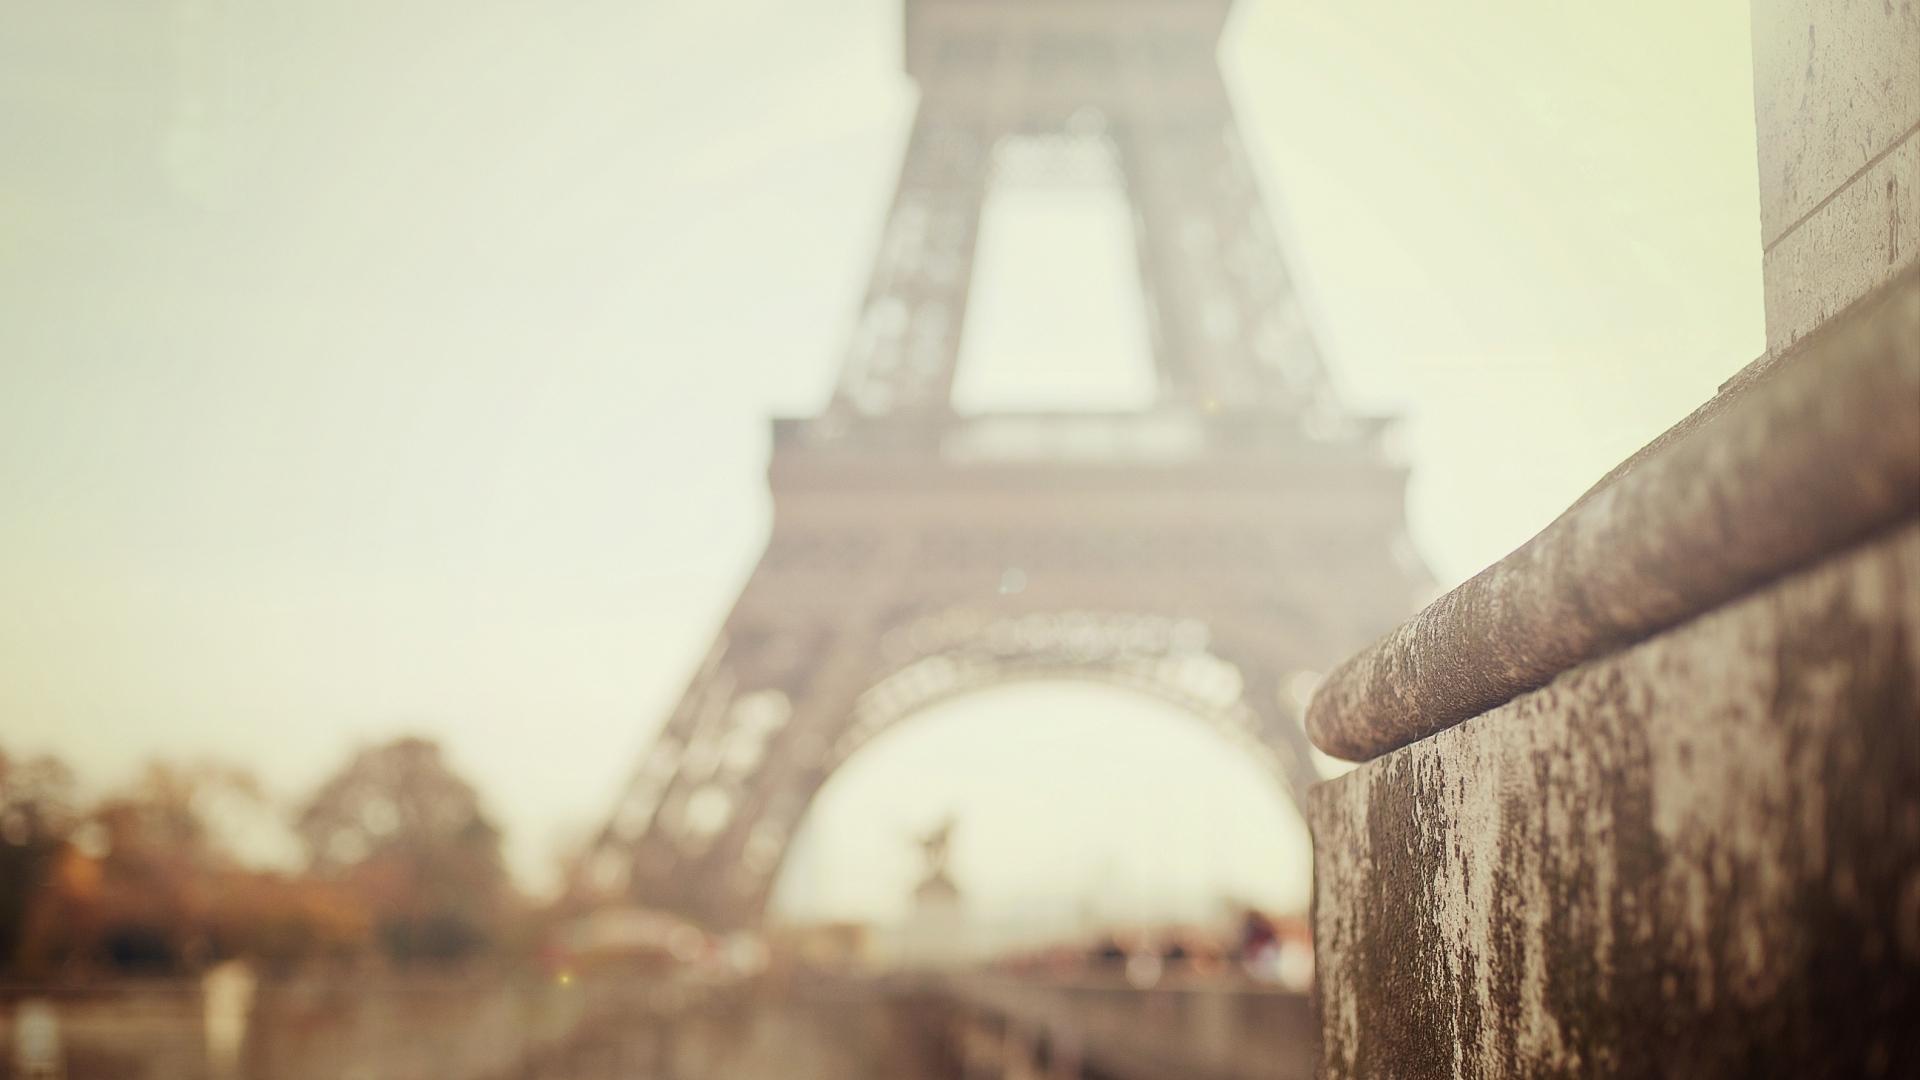 City-Paris-Eiffel-Tower-Bokeh-Focus-Blur-1920x1080-Need-iPhone-S-Plus-Background-wallpaper-wpc5803506